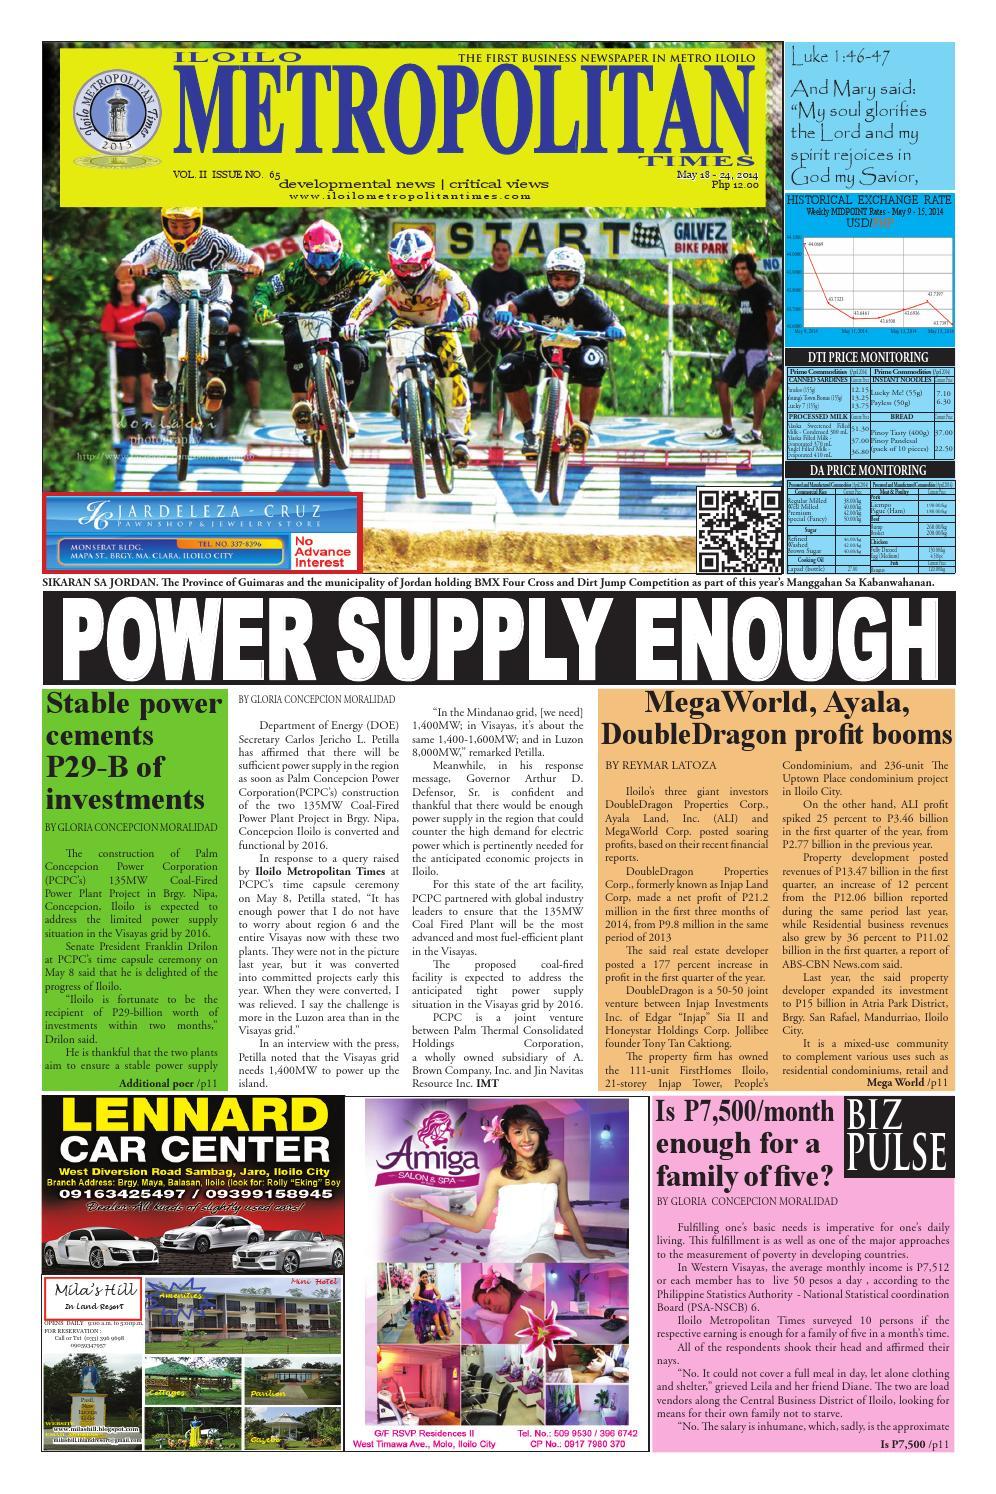 Iloilo Metropolitan Times Volume 2 • Issue 65 by trIsofT - issuu